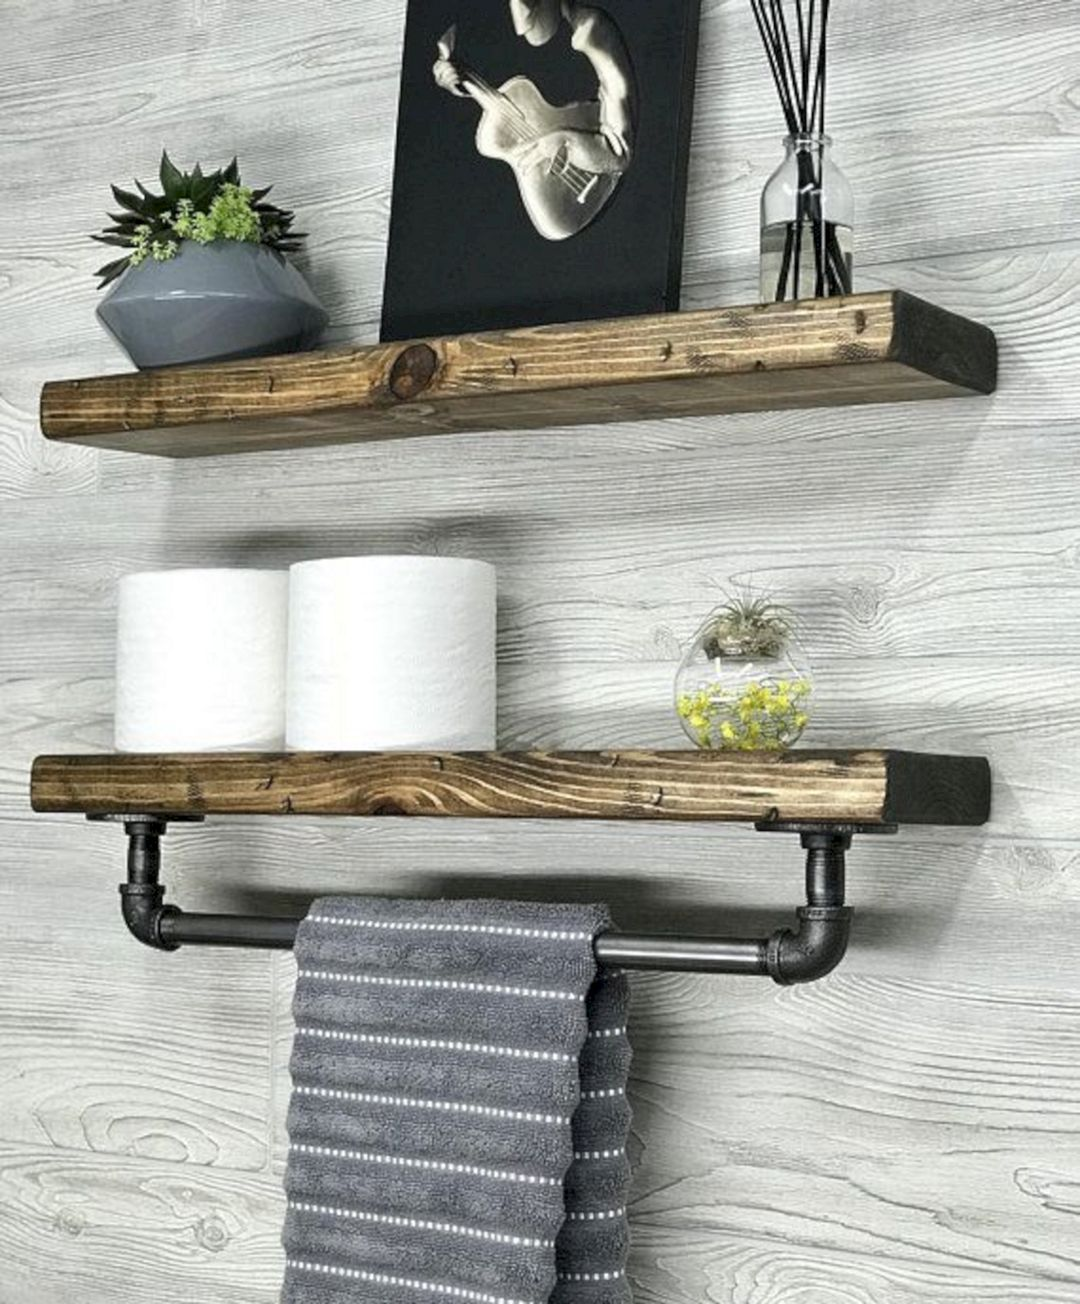 extraordinary girls bathroom organization idea   20 Extraordinary Rustic Bathroom Wall Shelves And ...